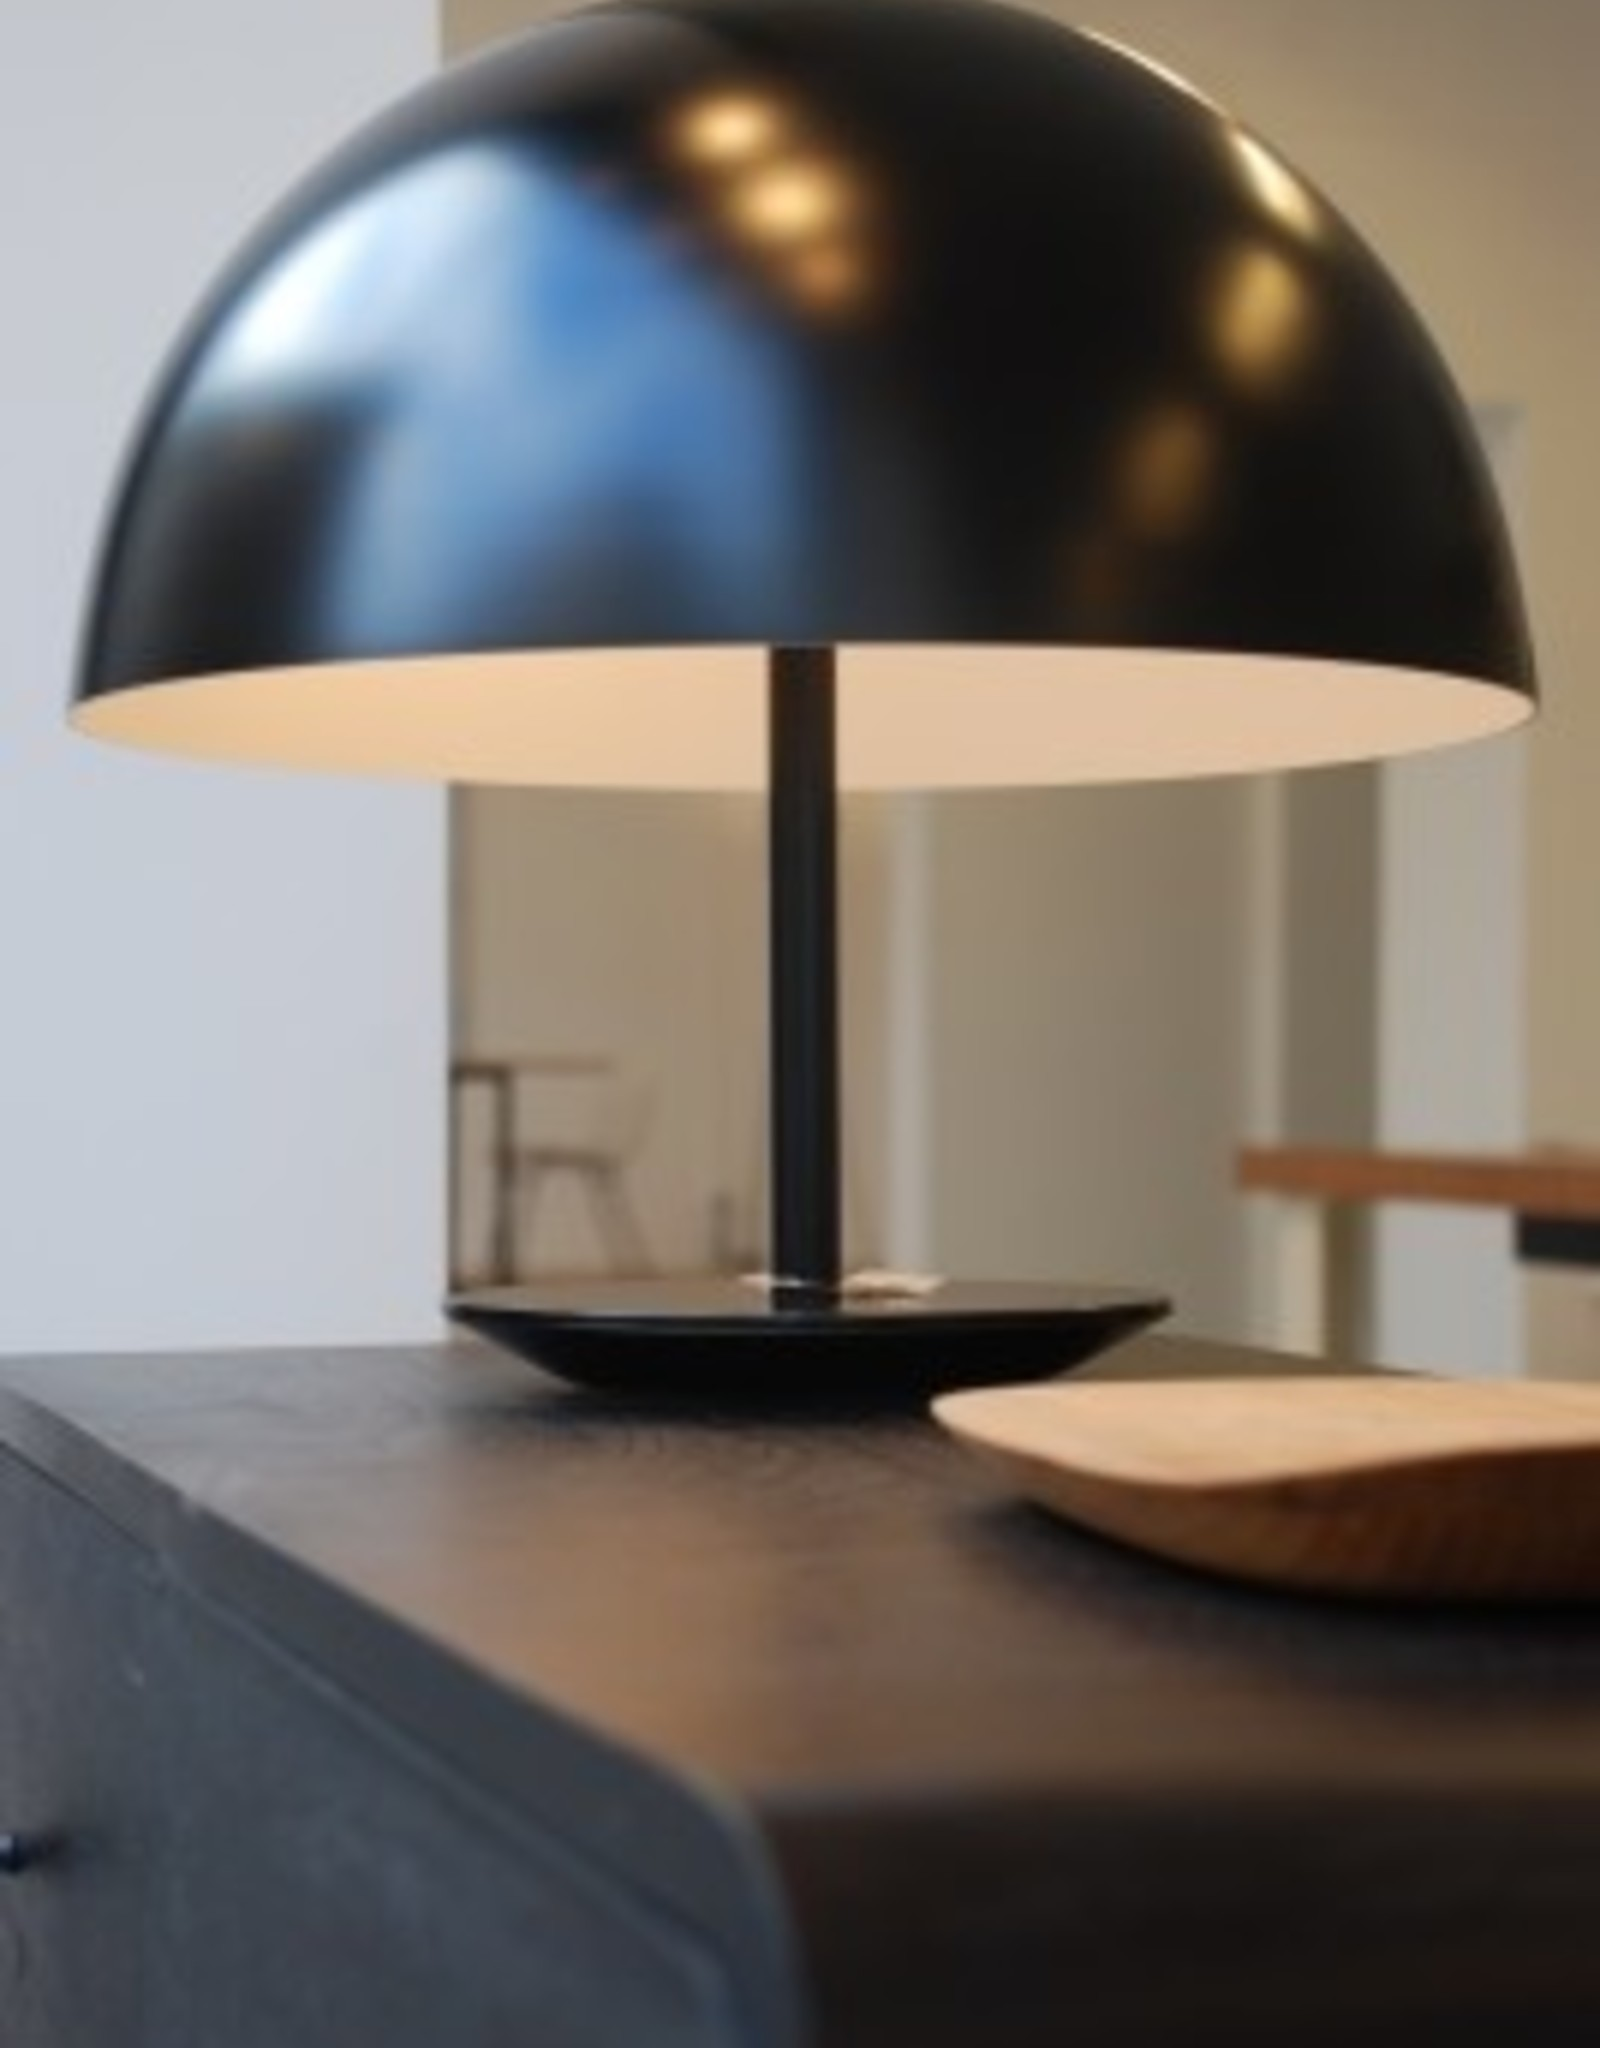 MATER DOME LAMP - ZWART